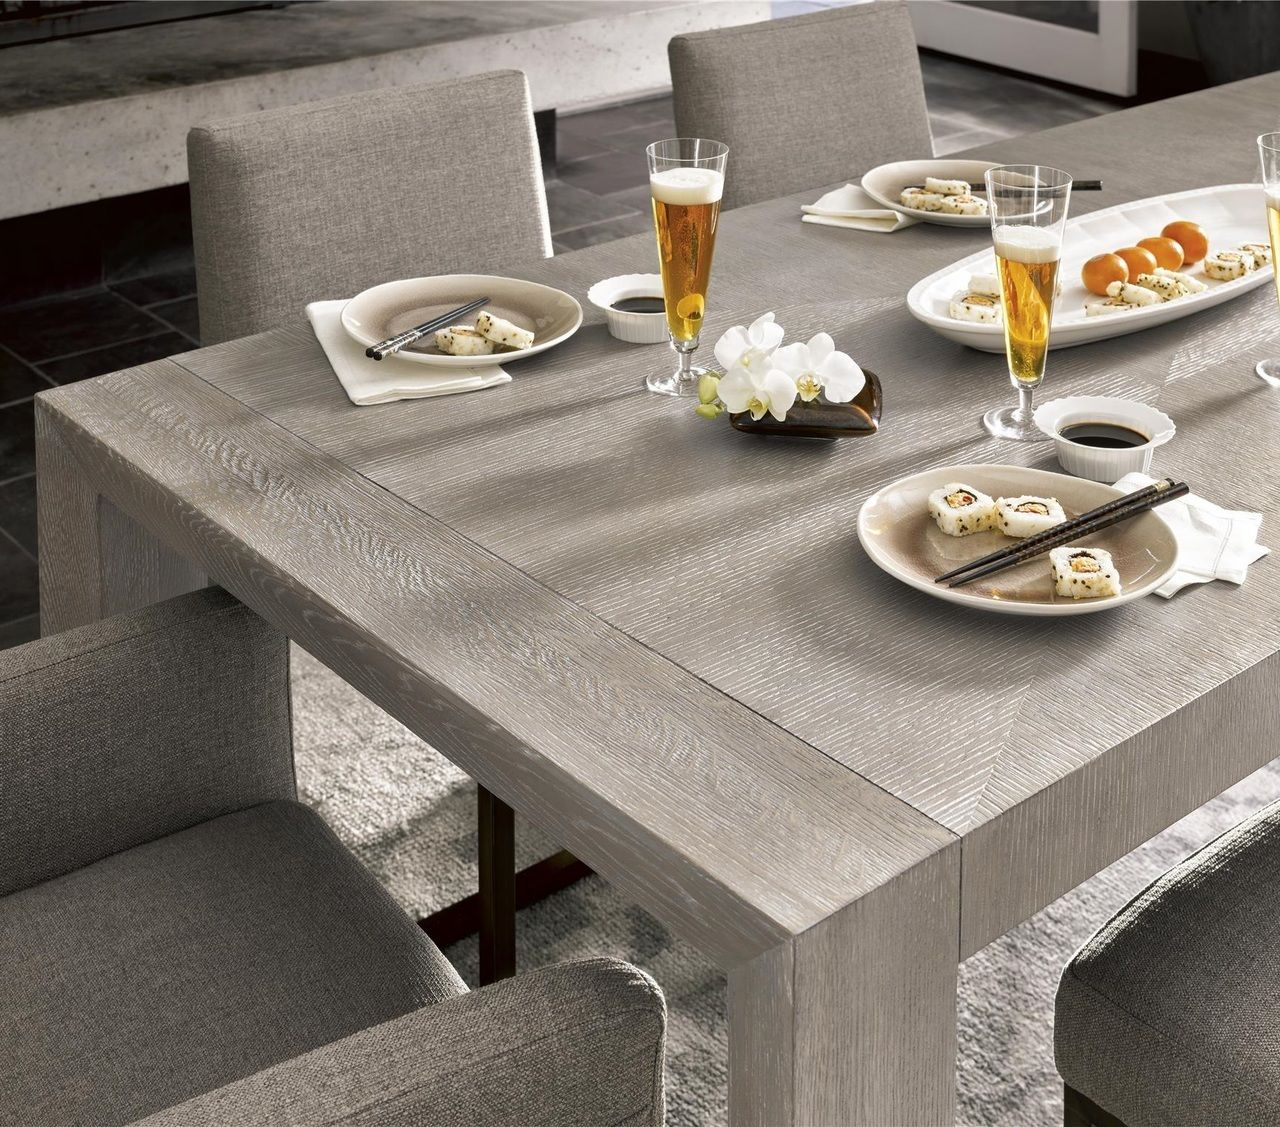 Langston Modern Grey Oak Wood Dining Room Table 84 Wood Dining Room Table Dining Table In Kitchen Grey Dining